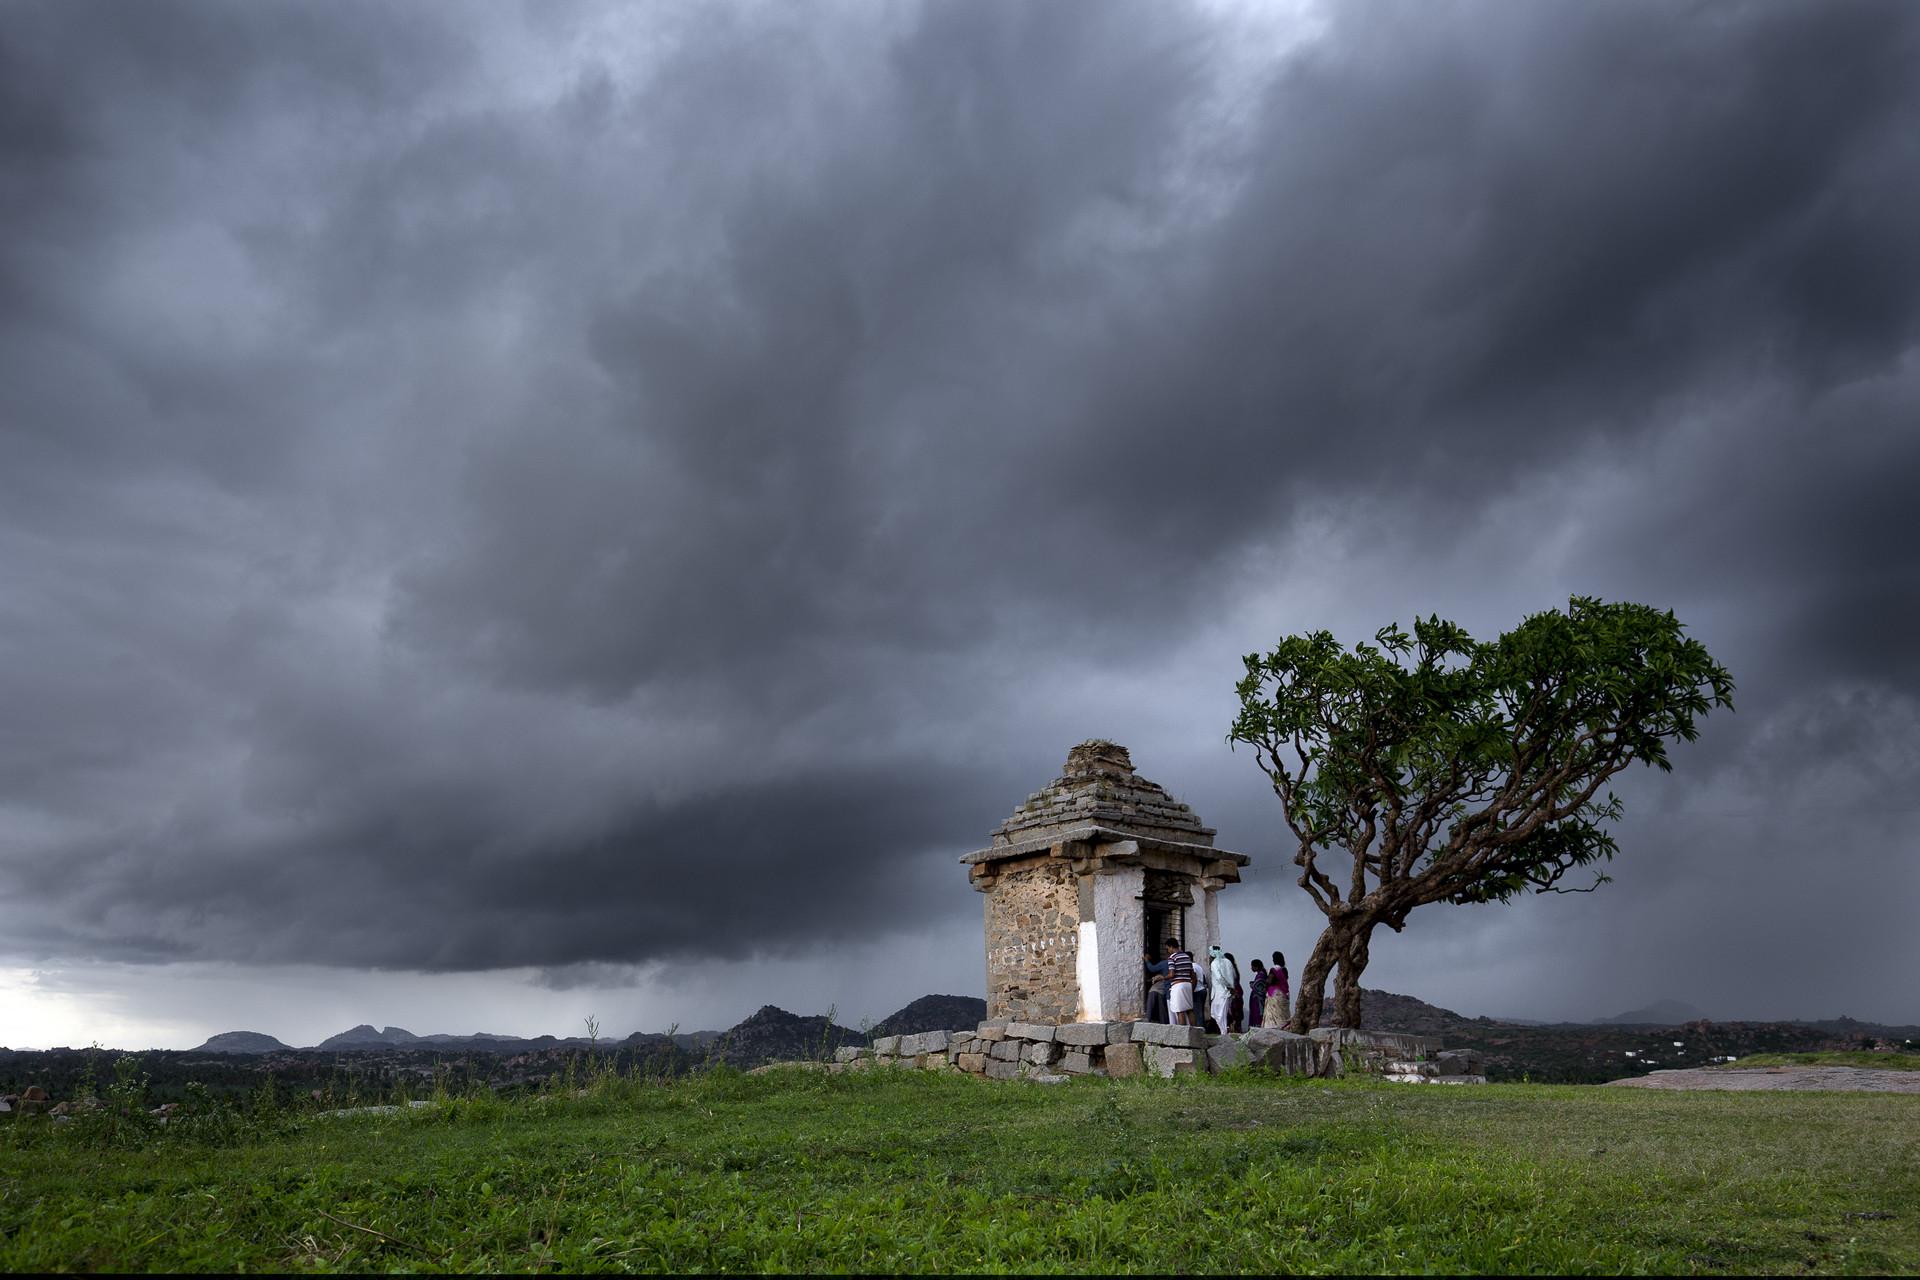 When dark clouds hover